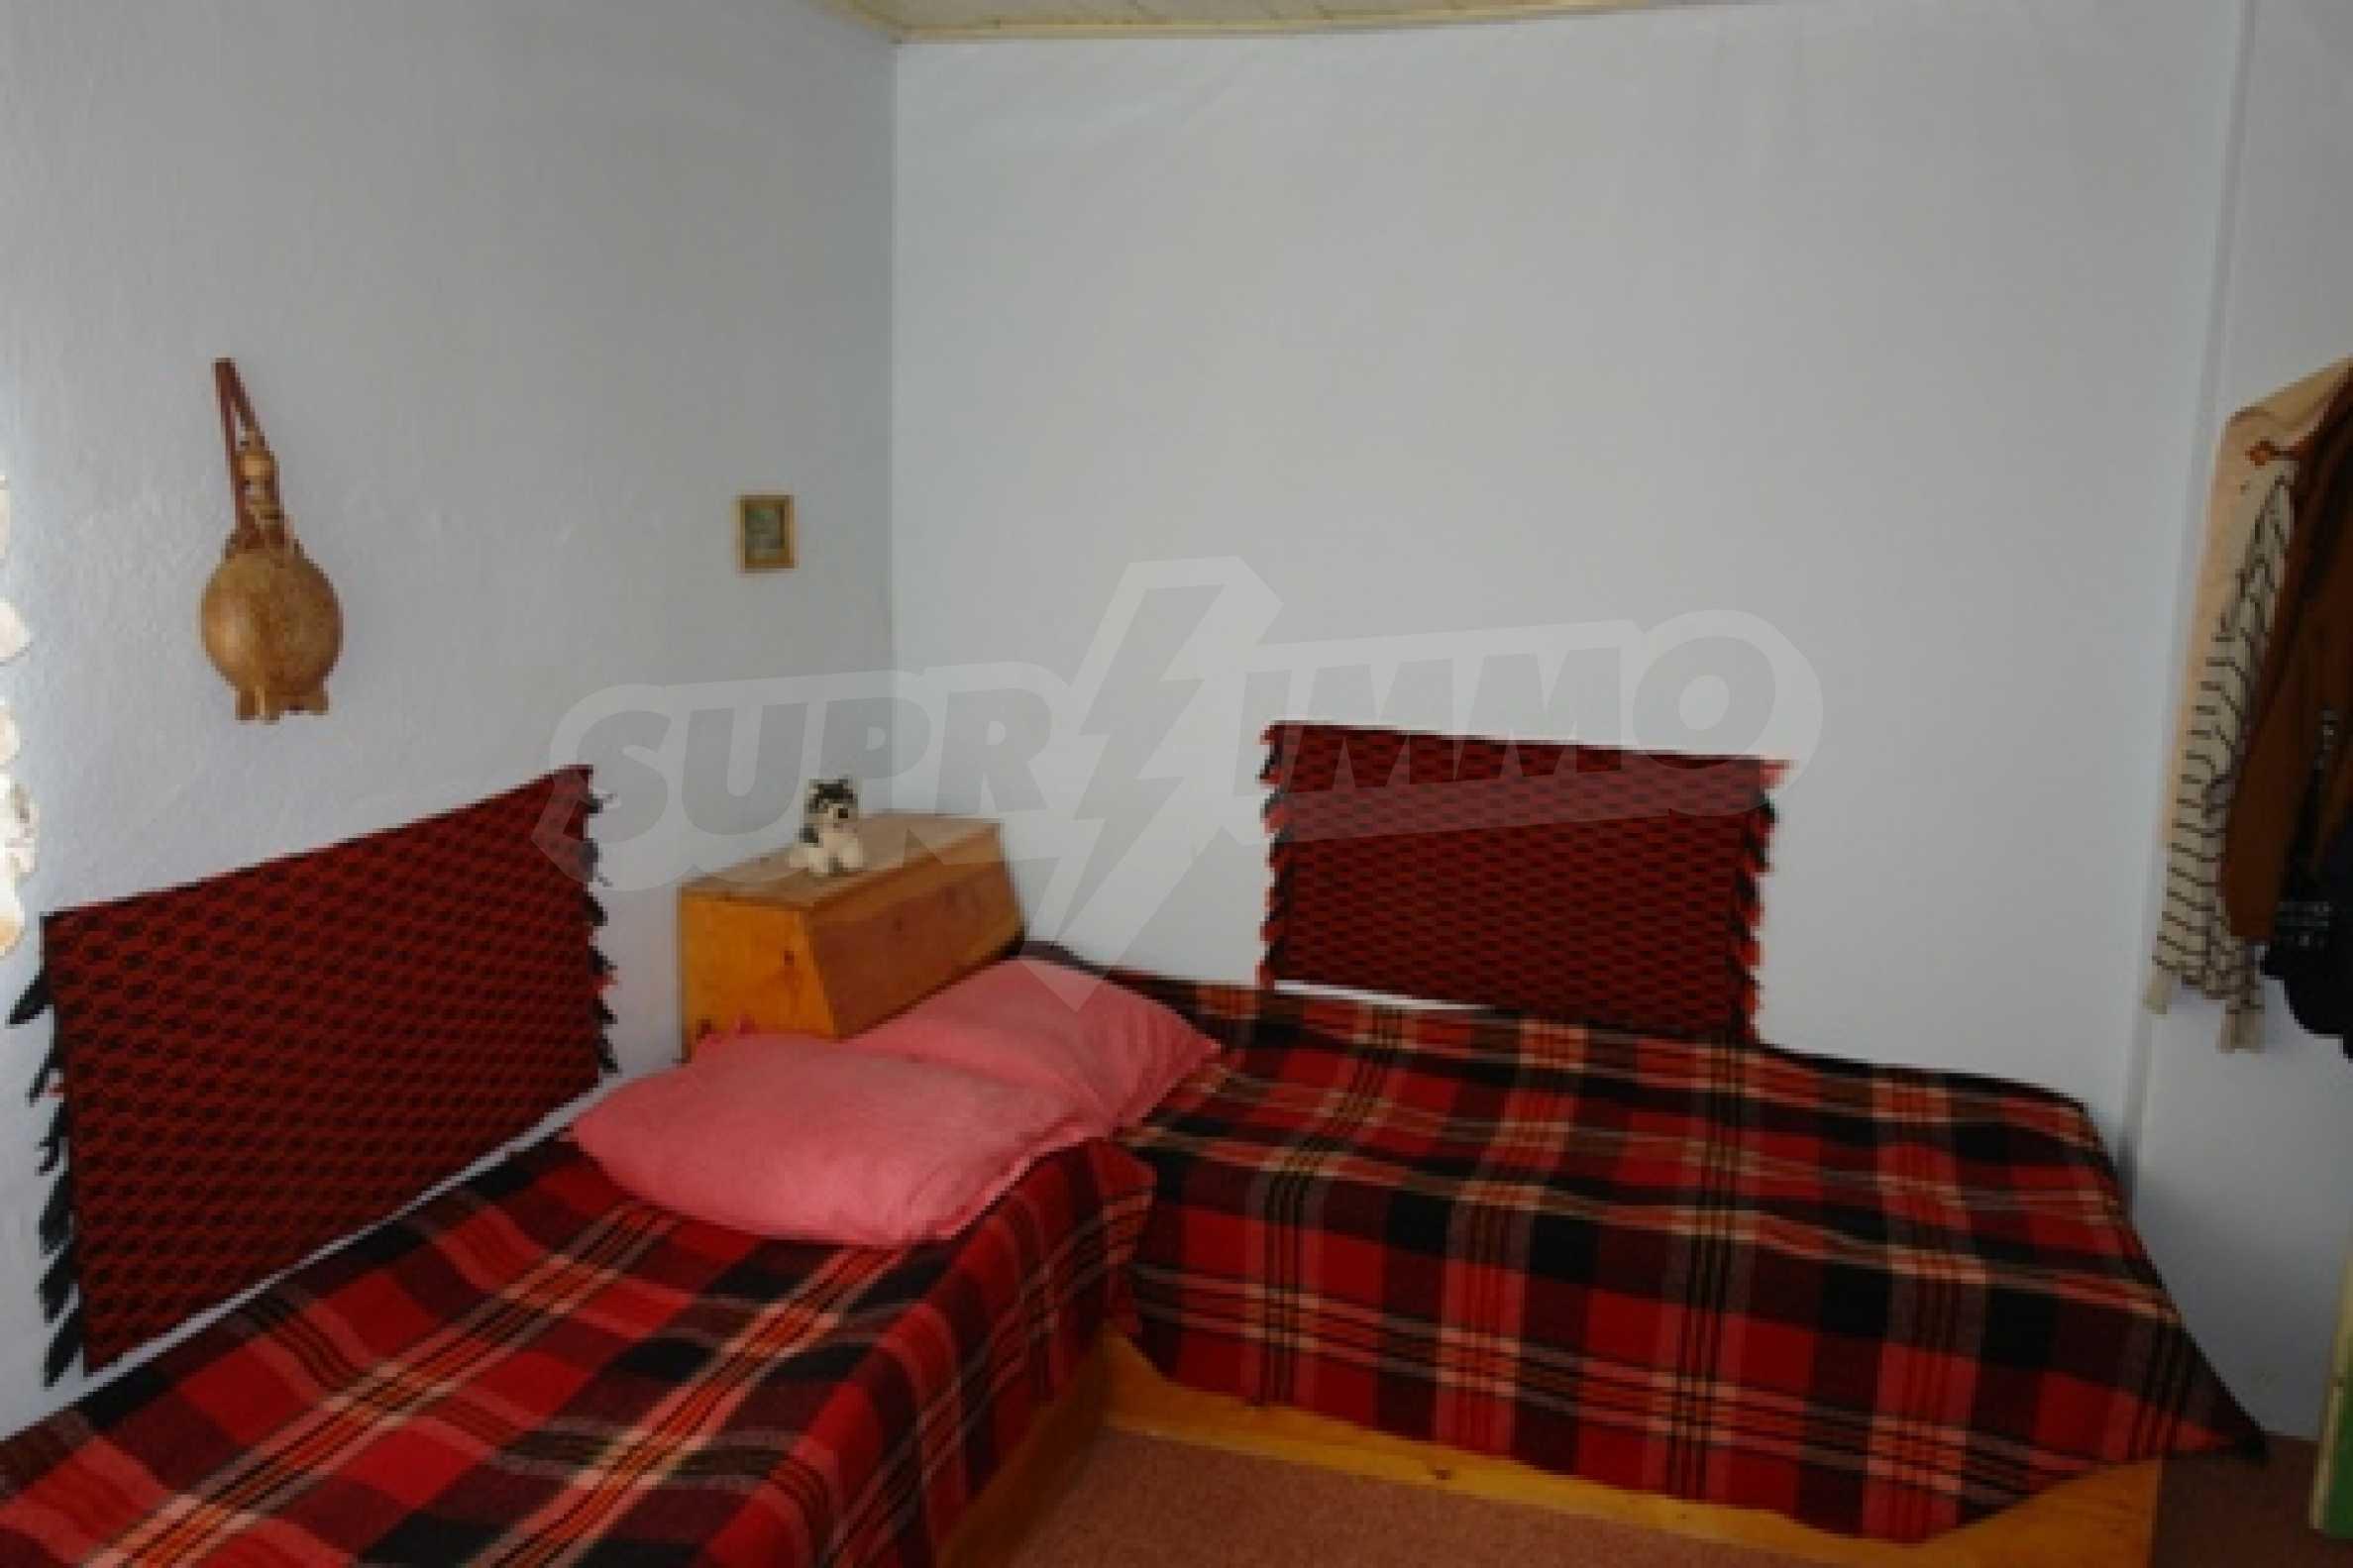 Spacious two-storey 4-bedroom house in Trastenik village, Ruse district 5